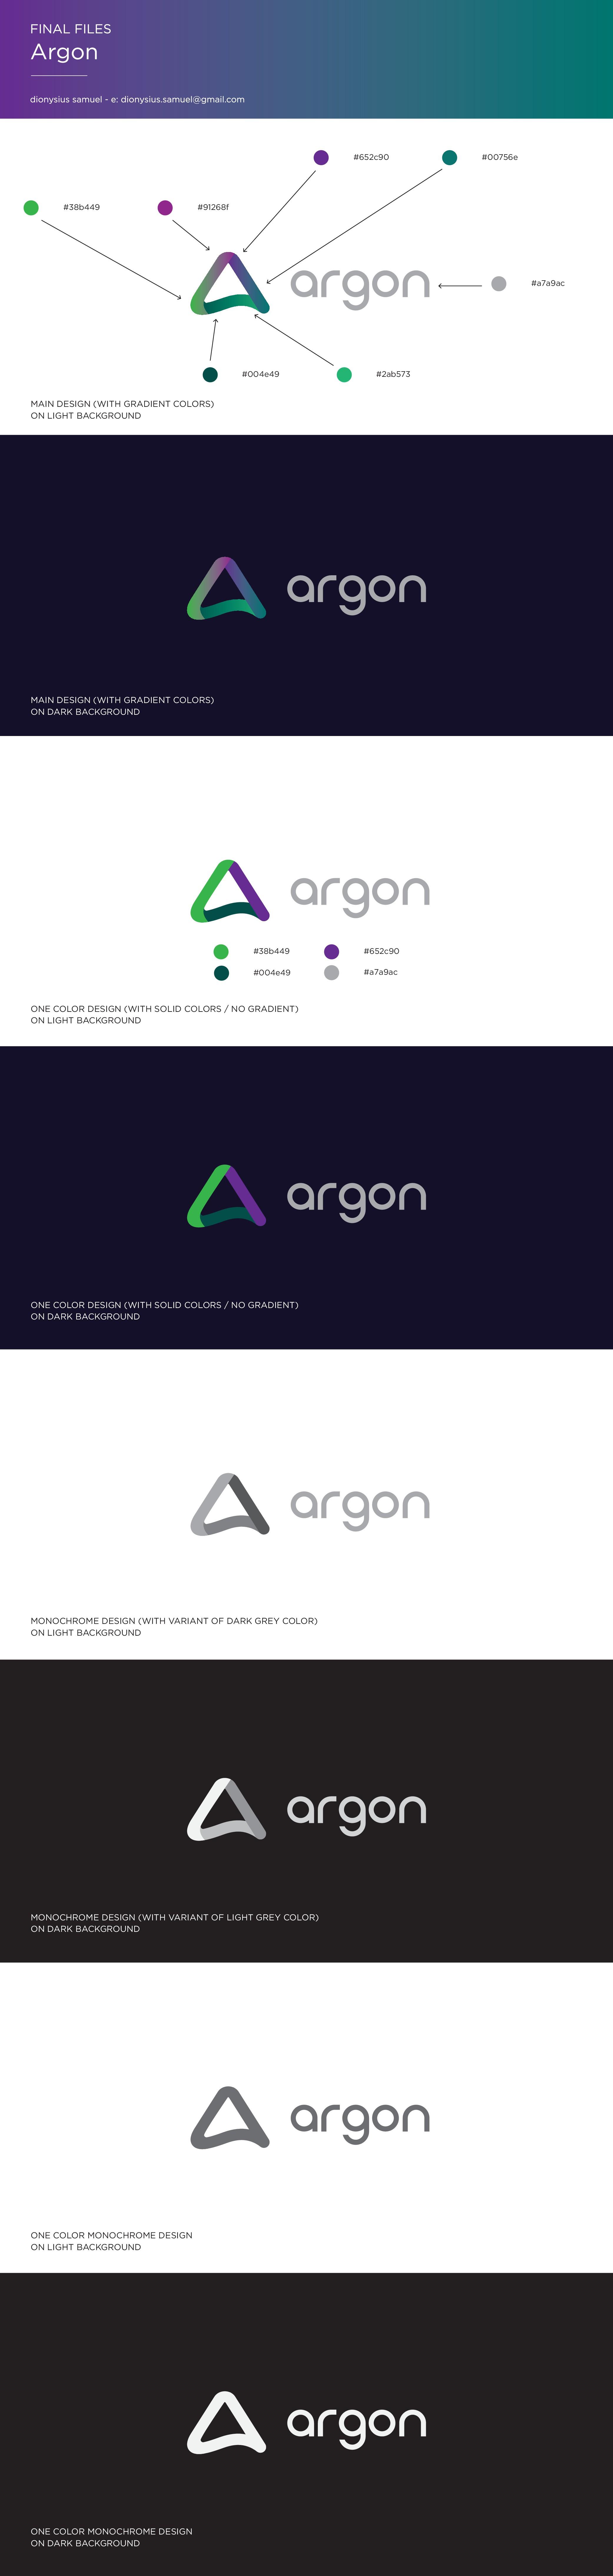 Argon Logo Design